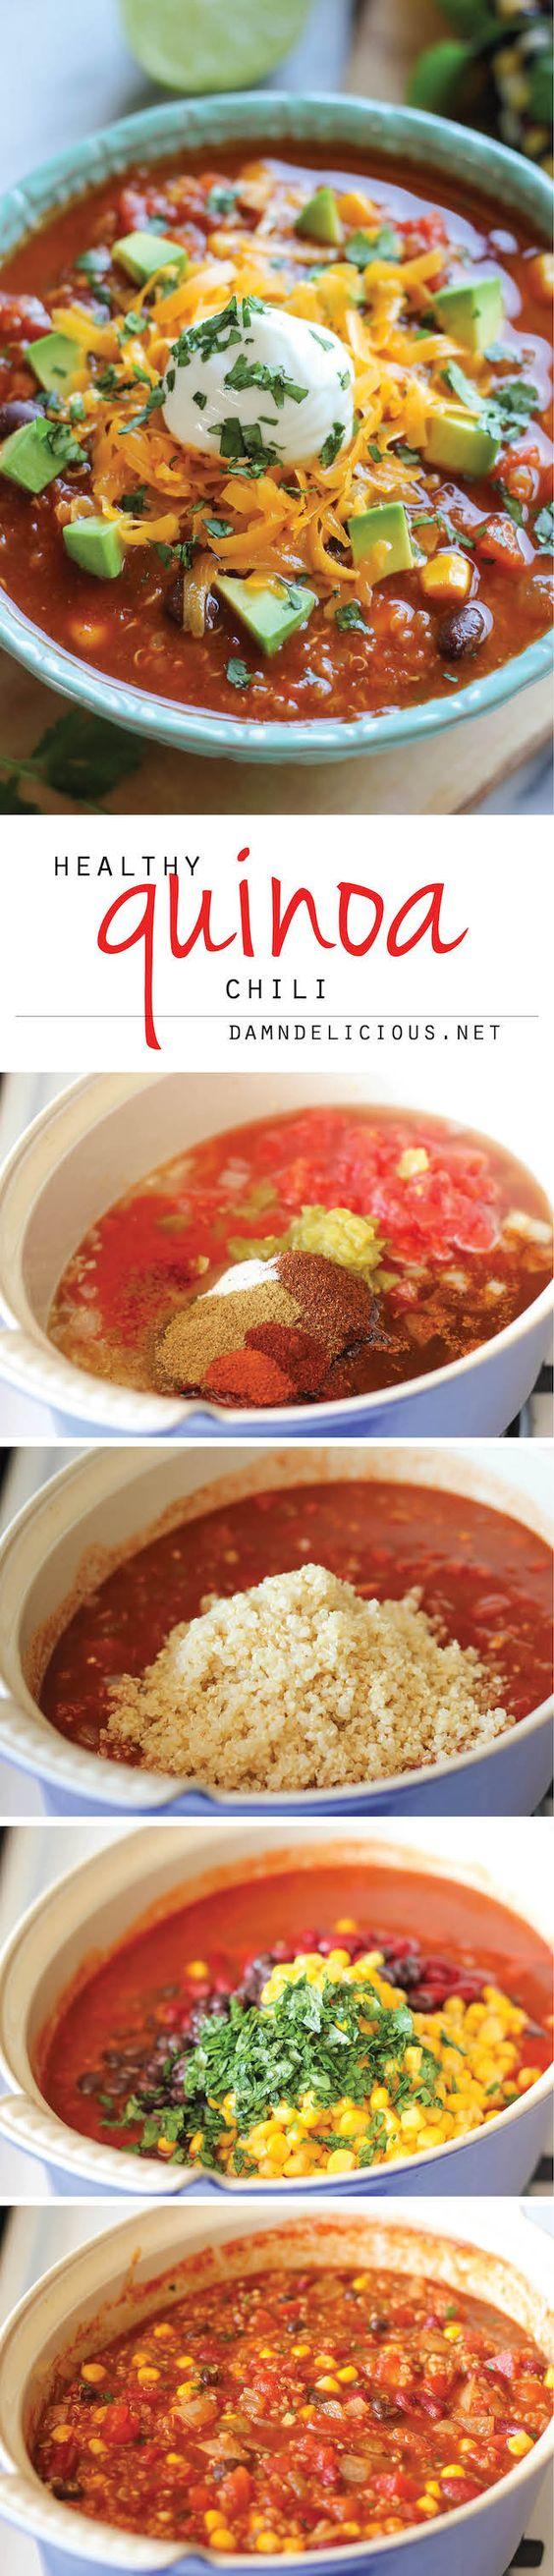 Quinoa chili, Vegetarian chili and Chili on Pinterest